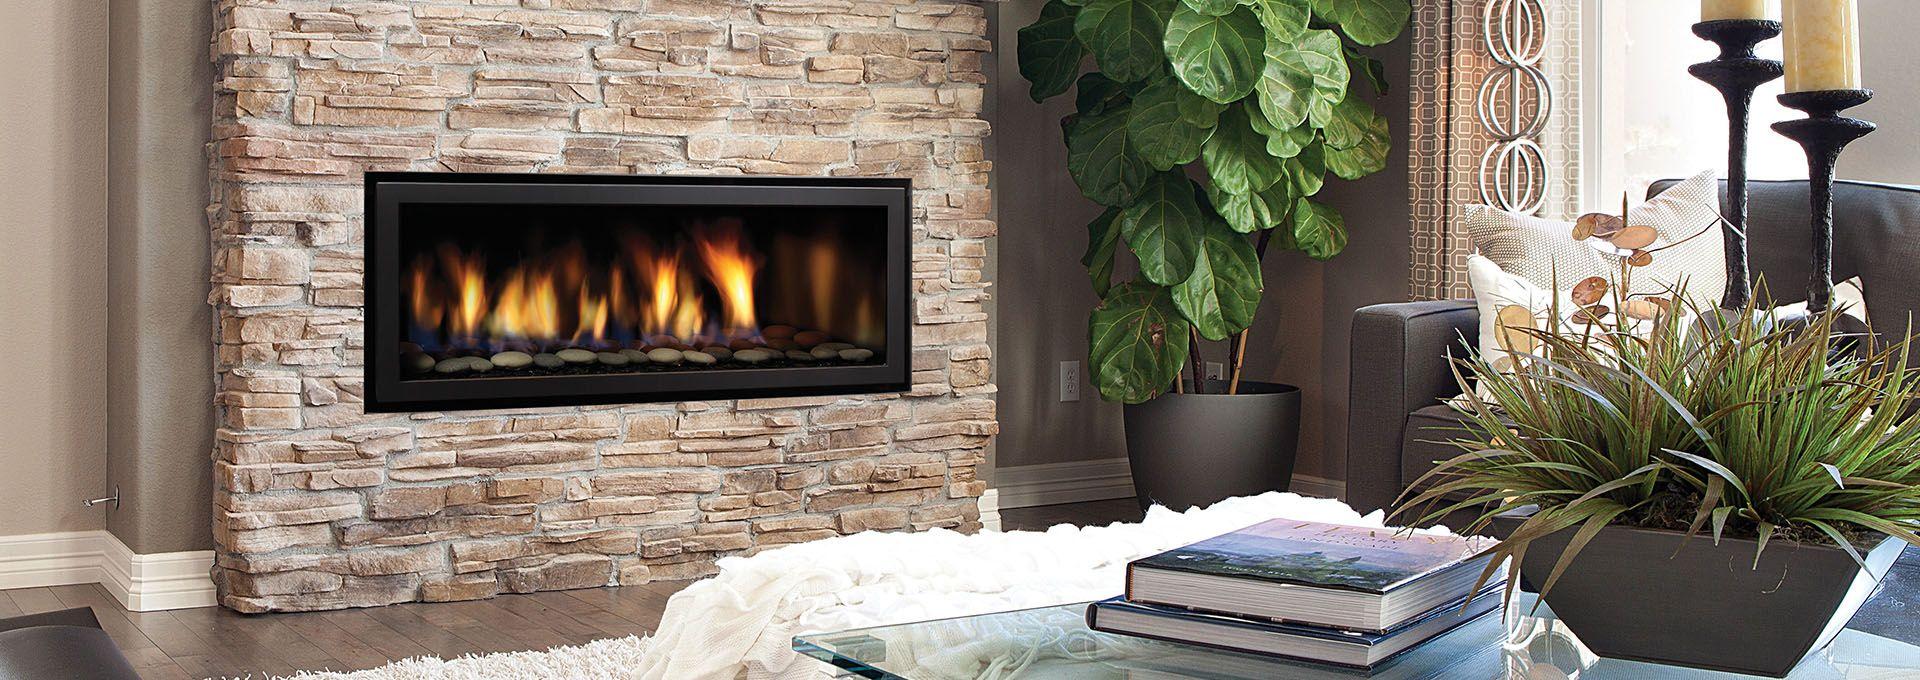 Authorized Regency Gas Fireplaces Dealer In Toronto The Gta